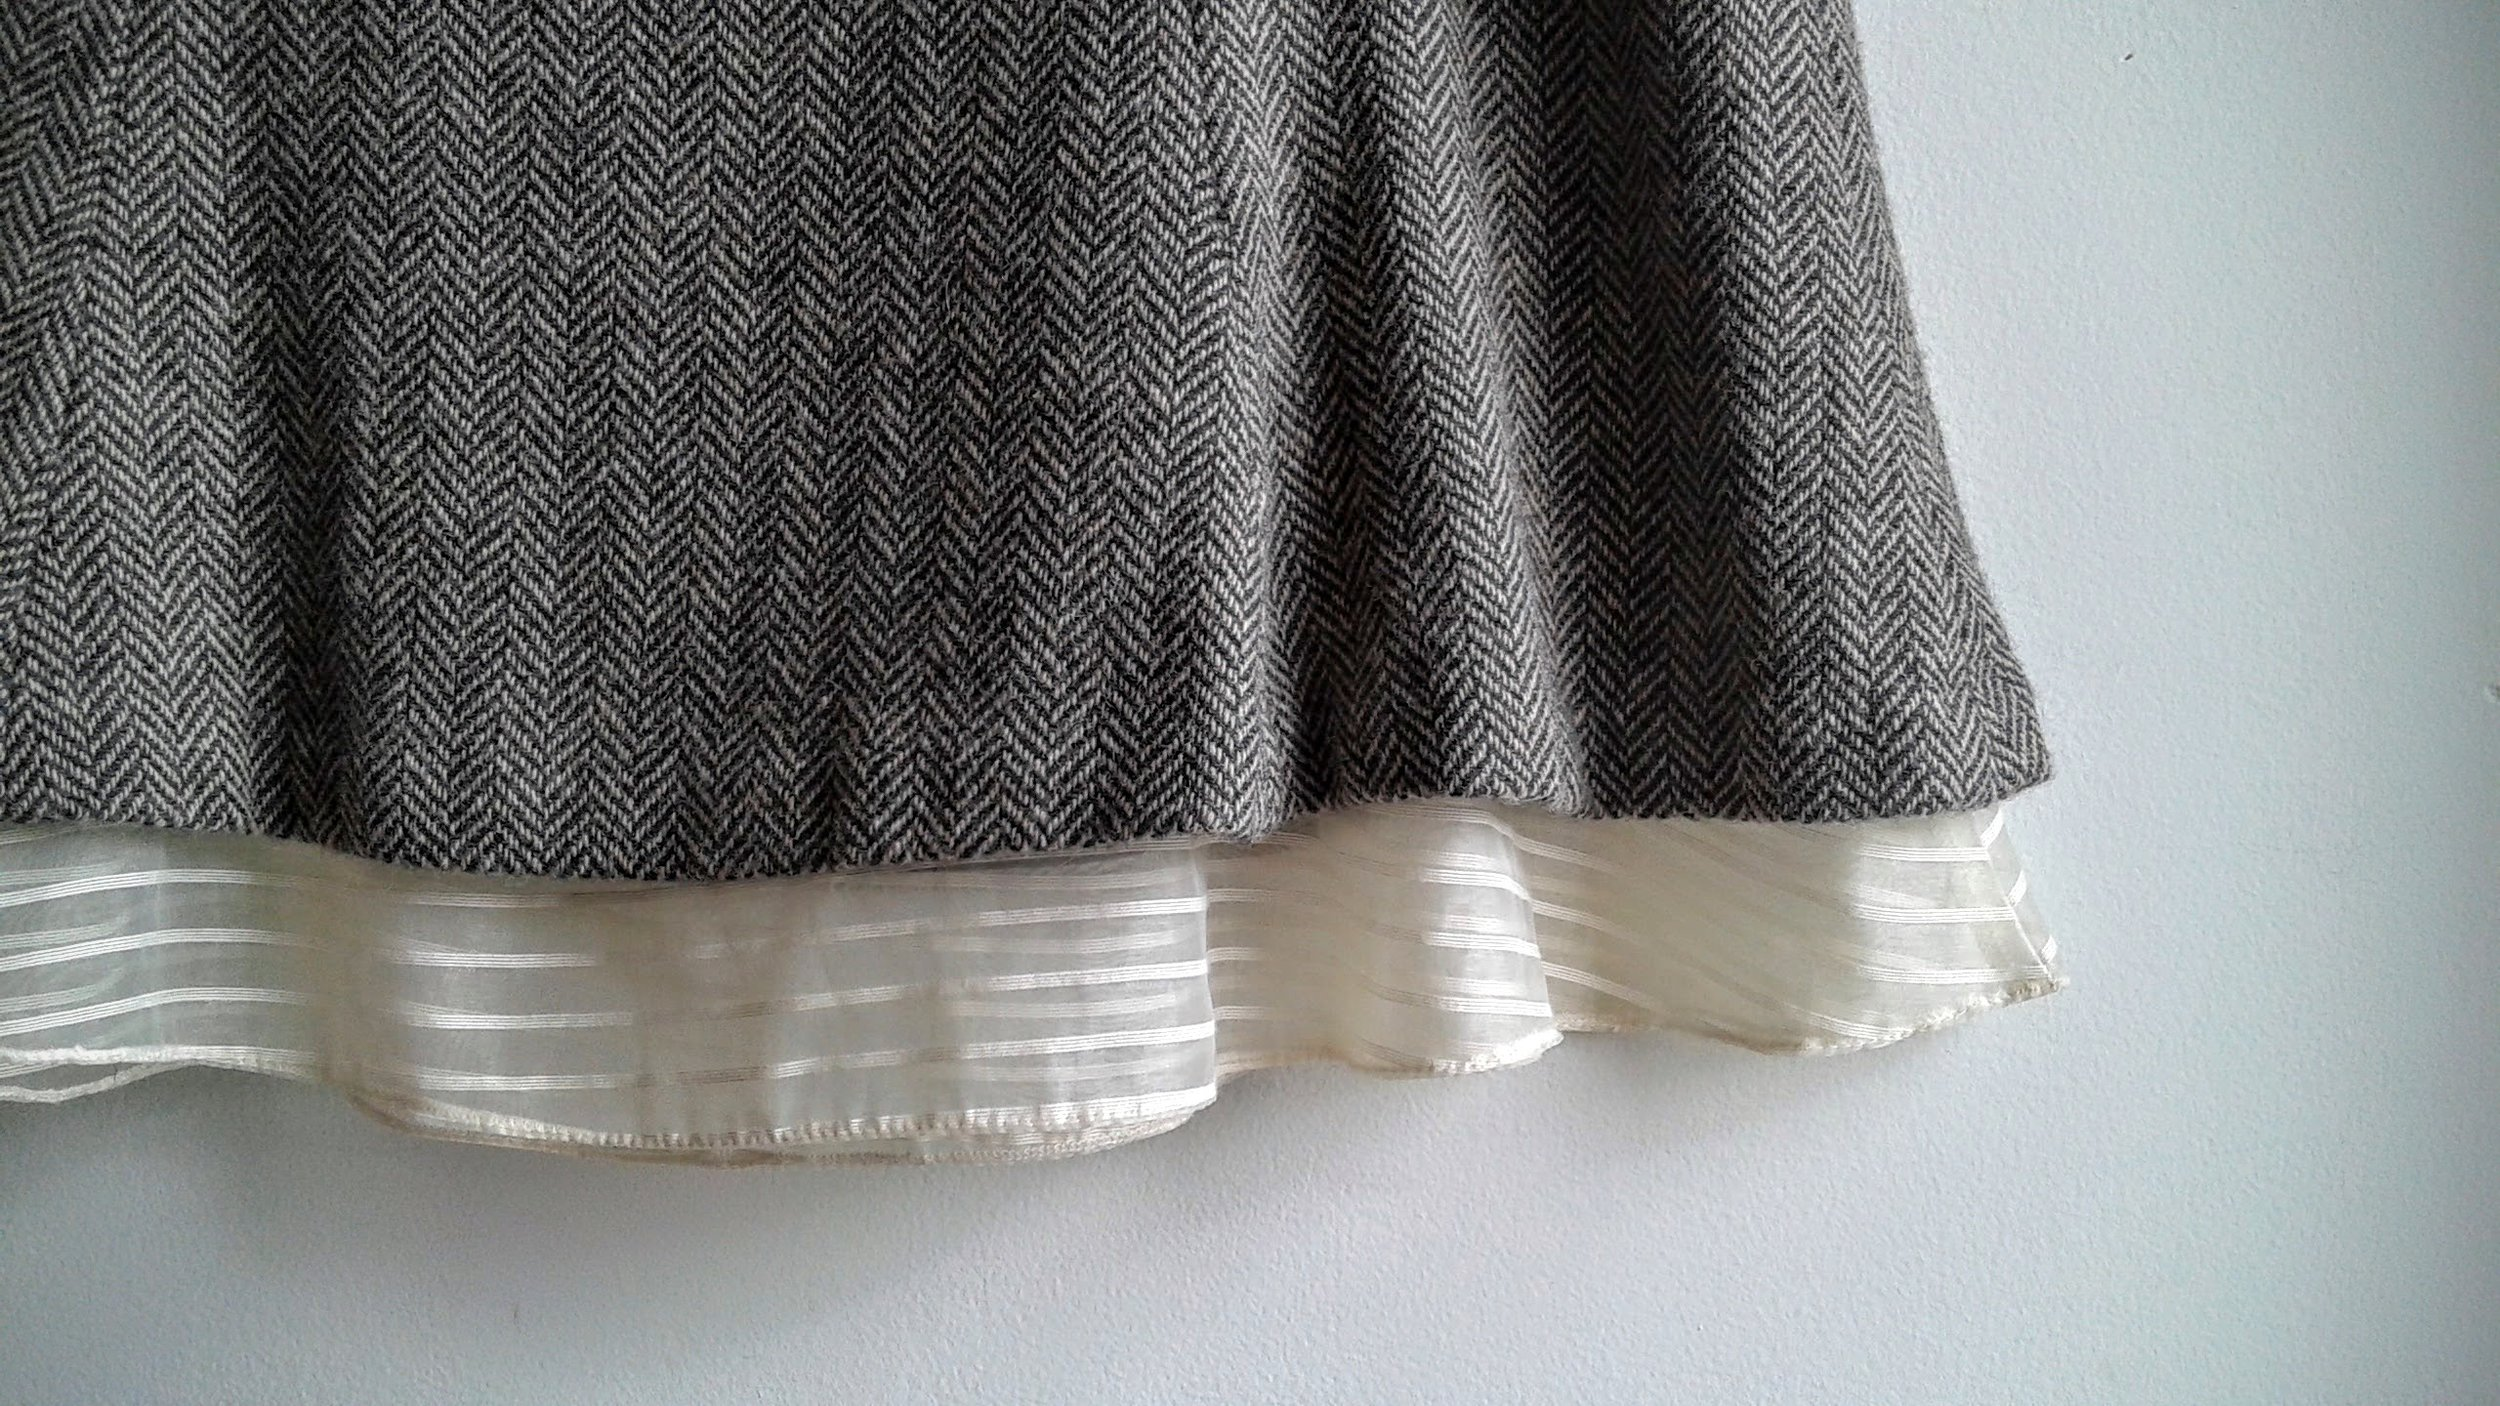 Gap skirt detail